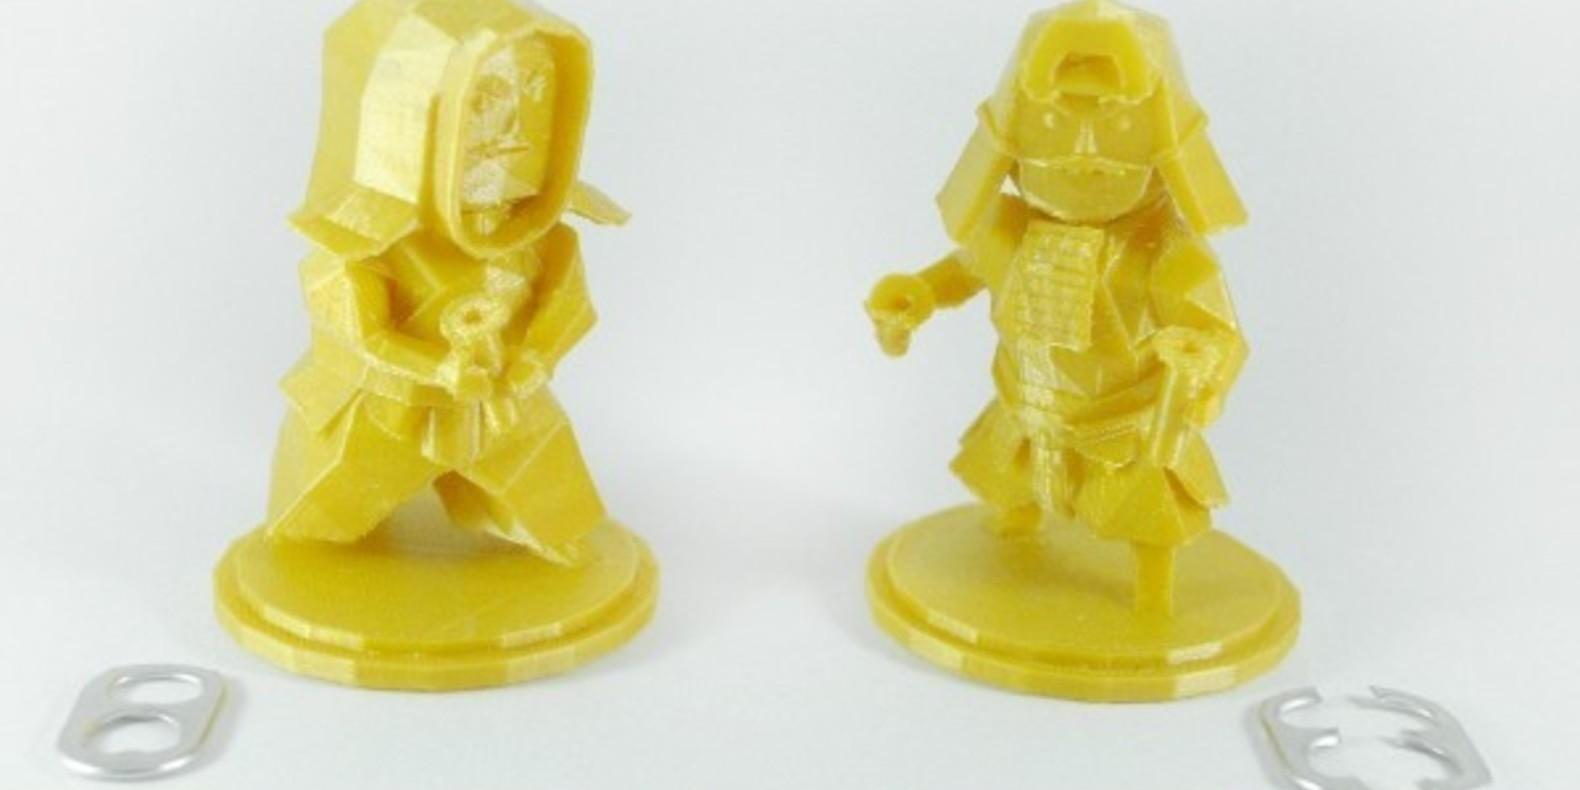 guerriers ninja cults 3D fichier 3D impression atomicosstudio tab capsule warriors 2